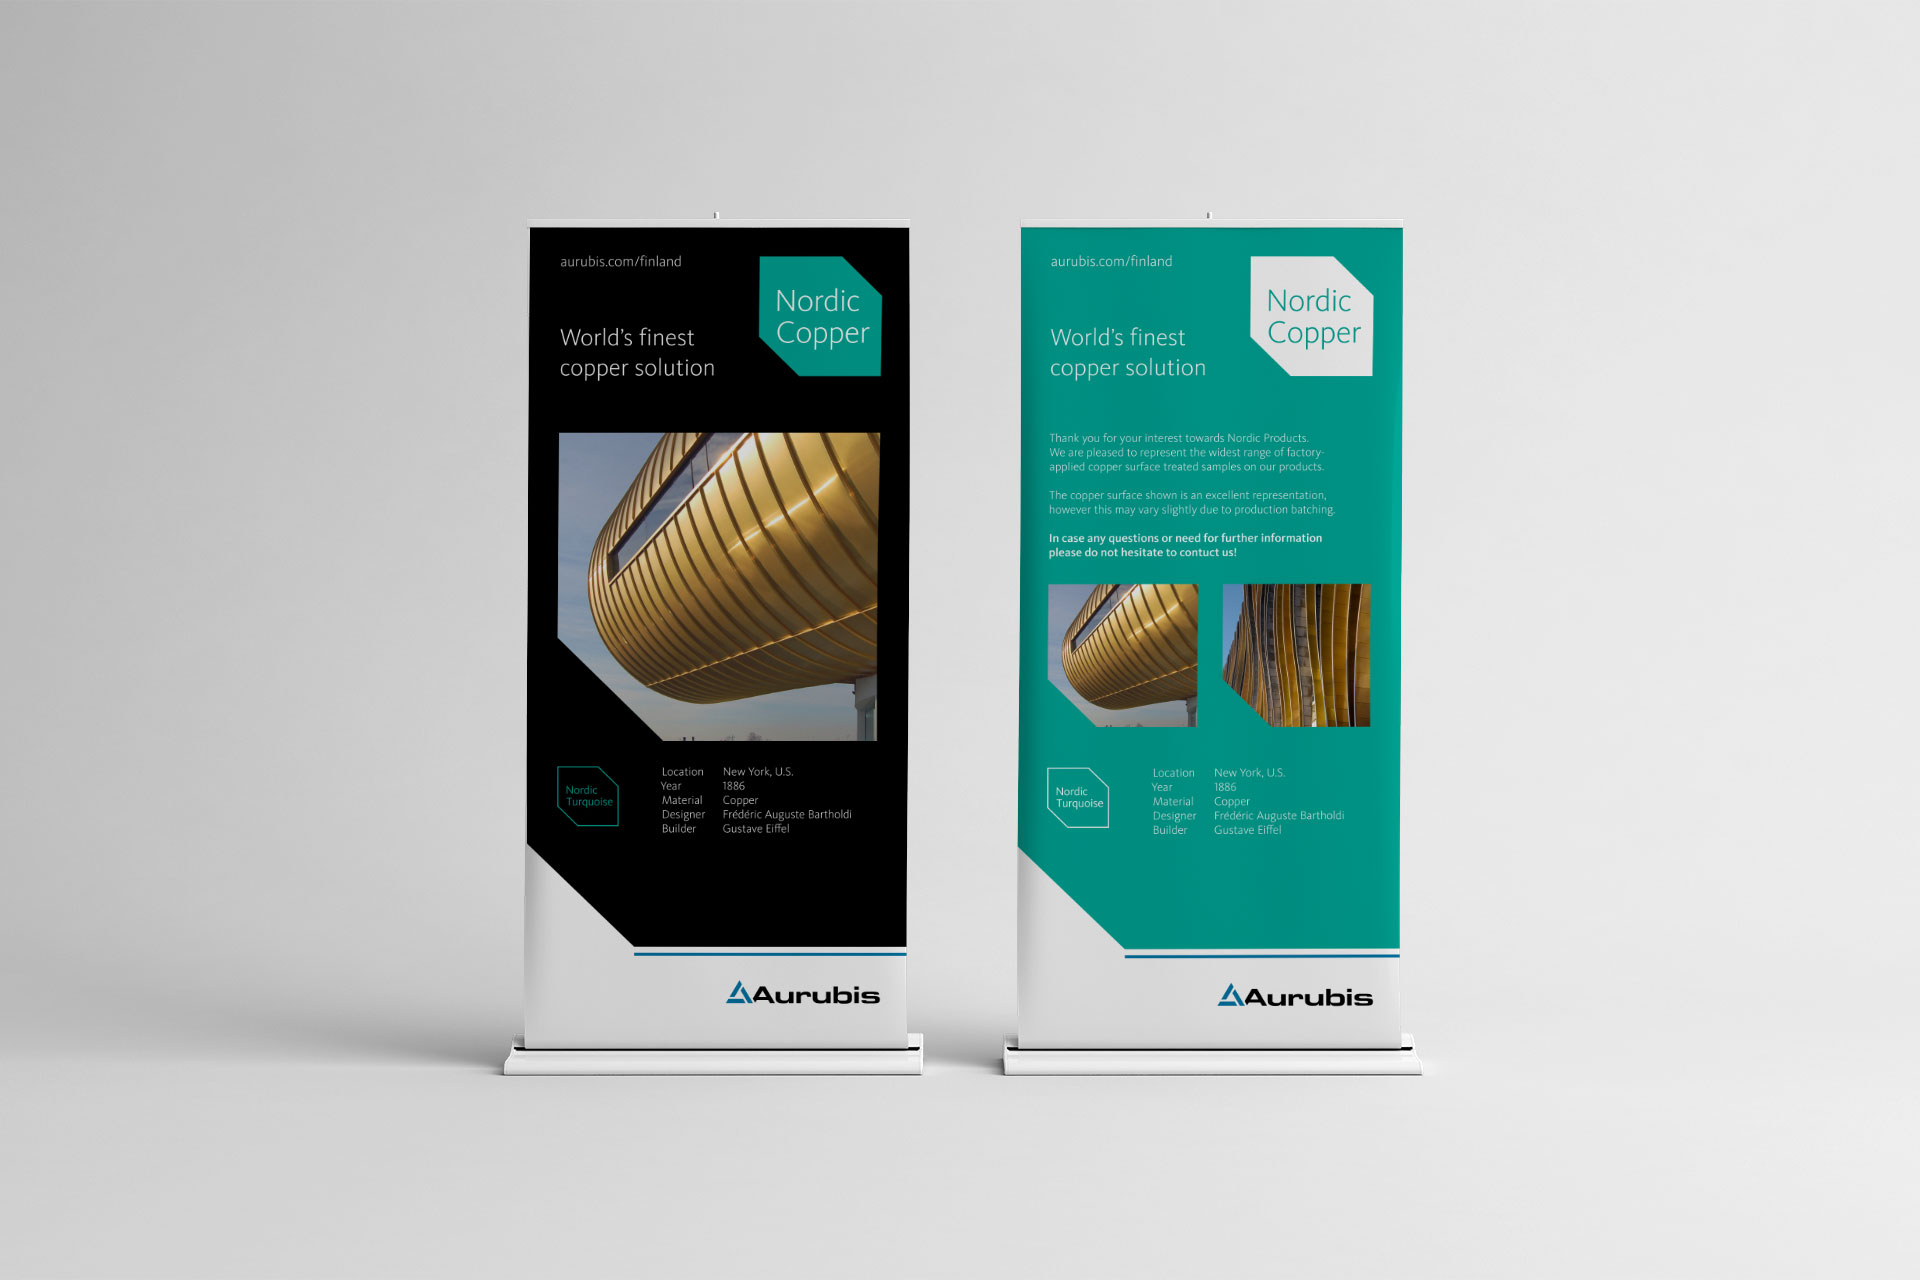 aurubis-nordic-copper display